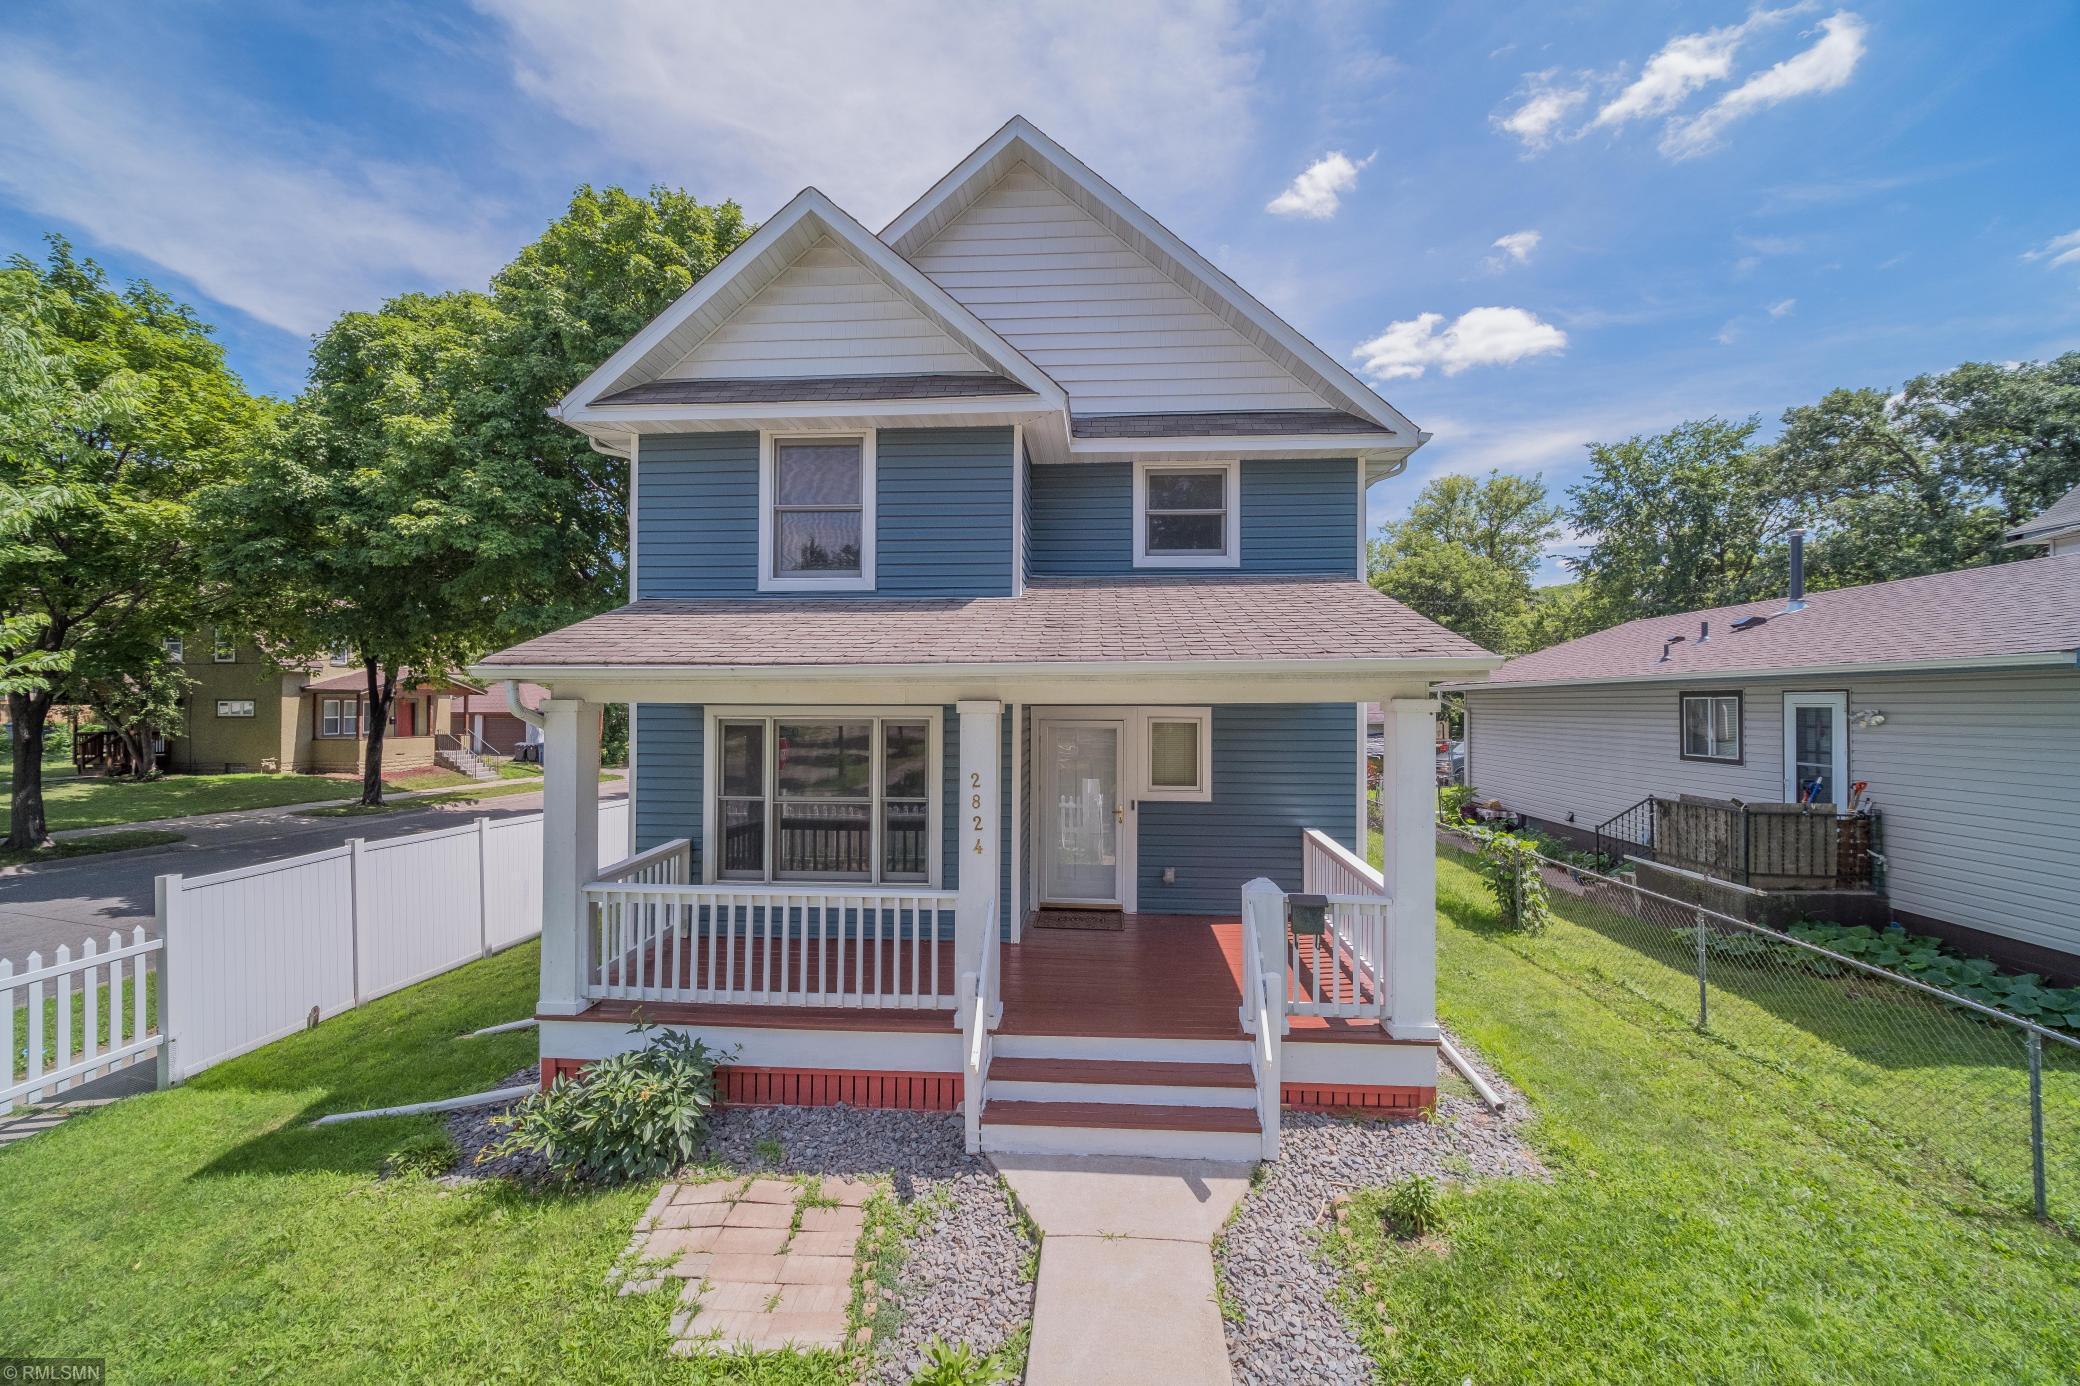 2824 Dupont Avenue N Property Photo - Minneapolis, MN real estate listing